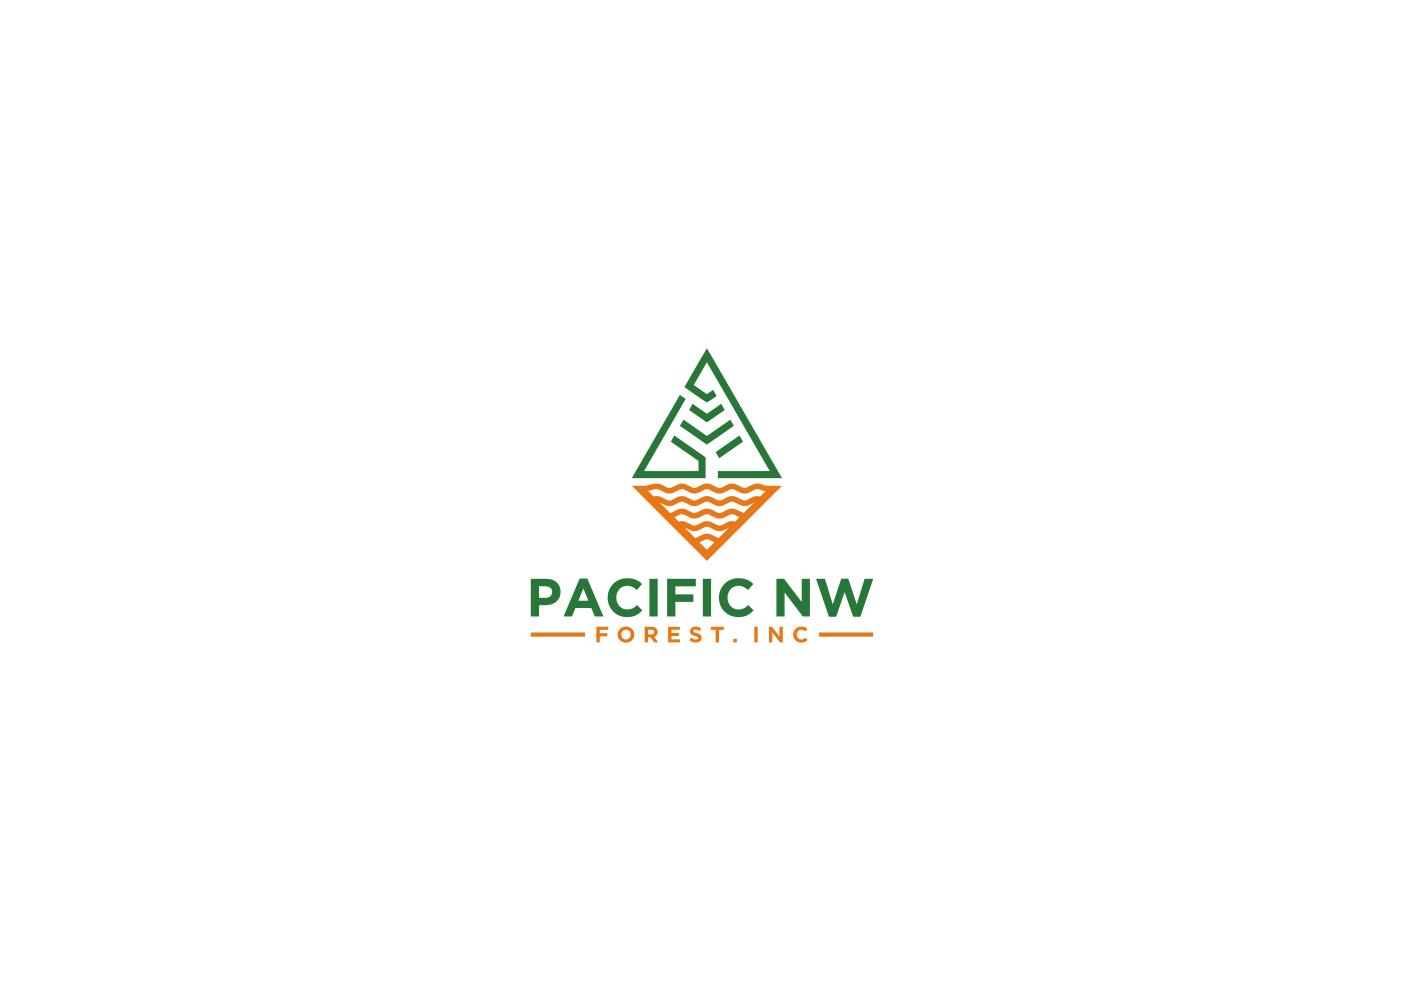 Winning Entry #75 for Logo Design contest - Forestry Logo Design required - original